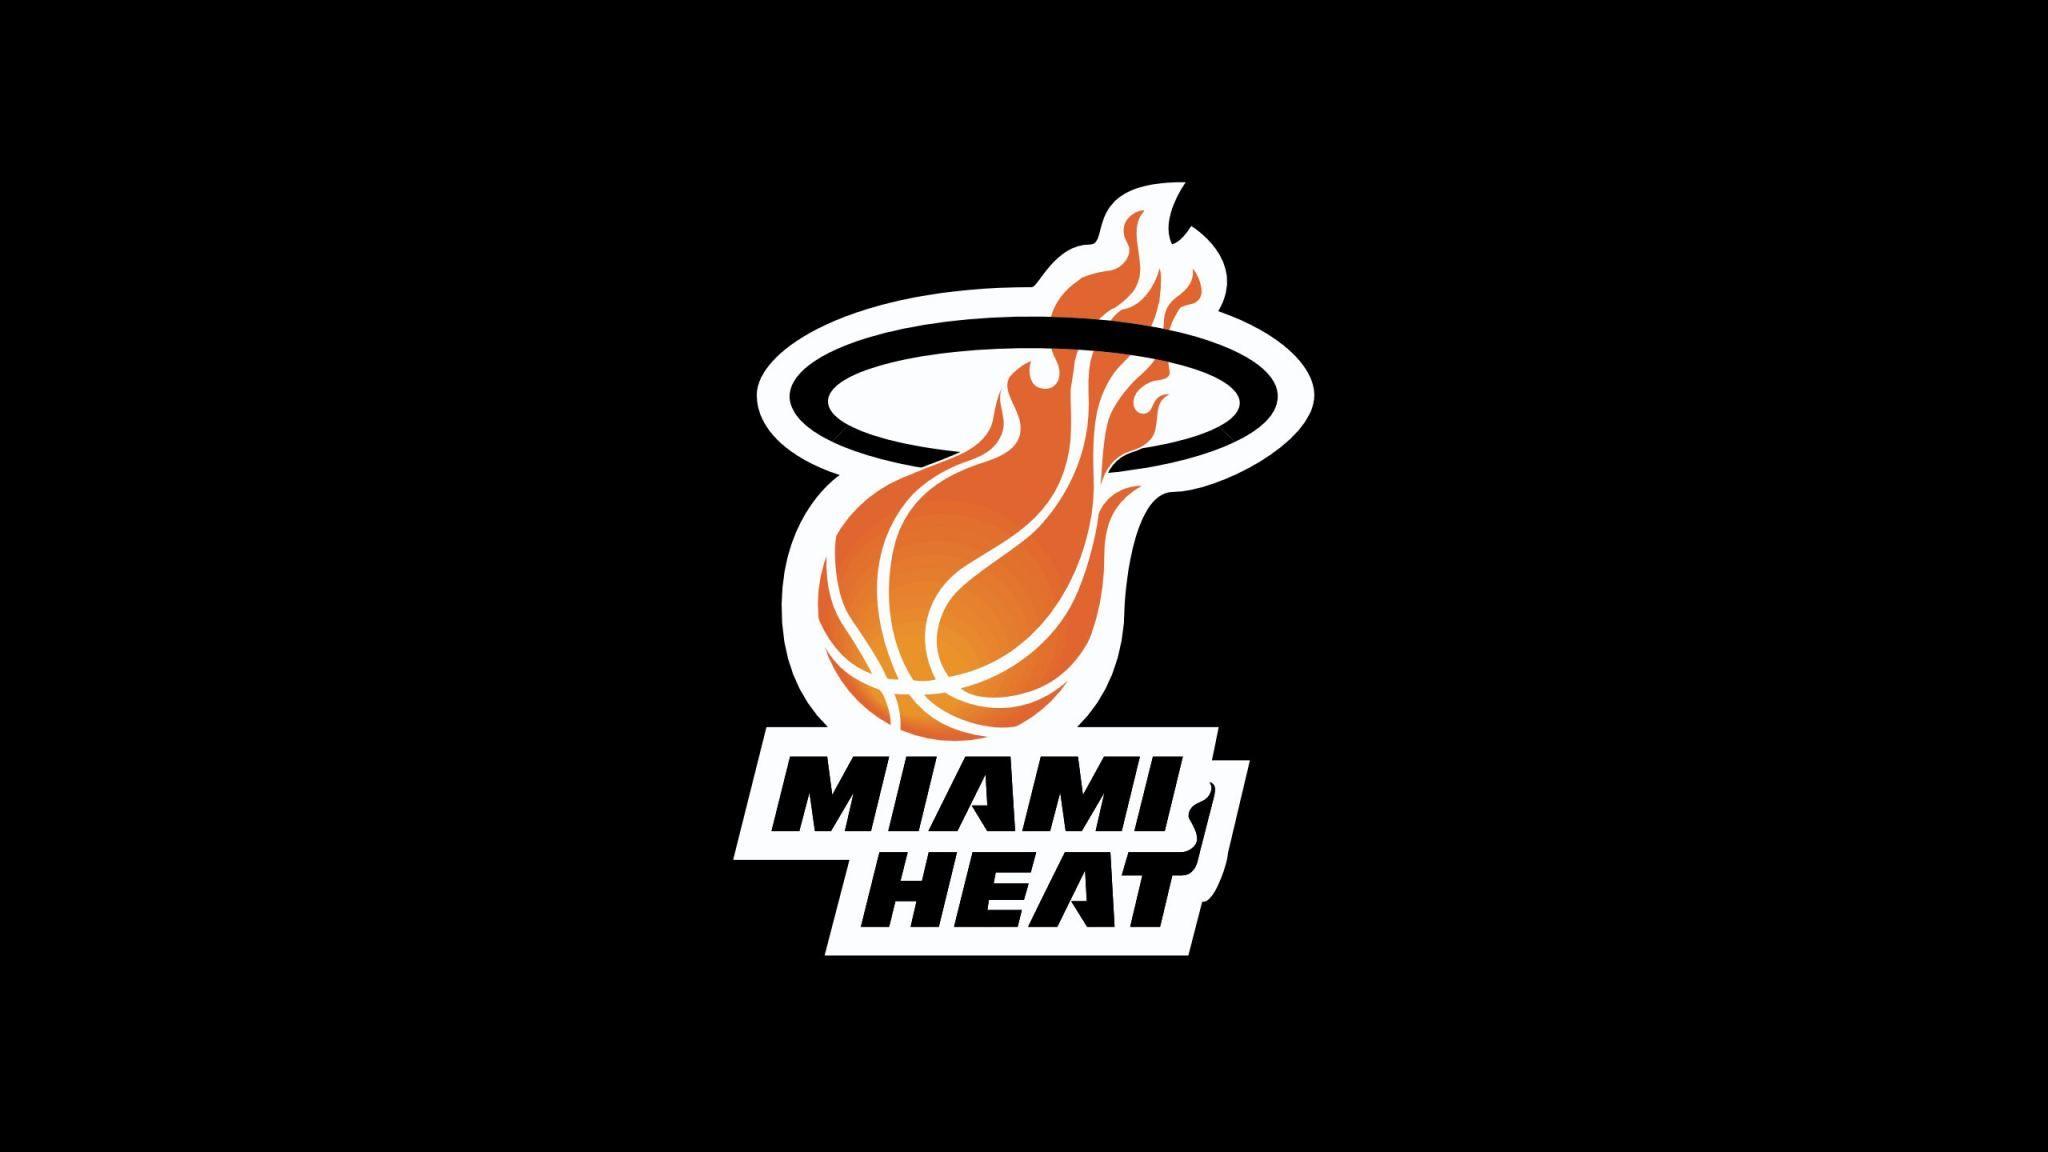 Pin By Steelslayer On Miami Heat Miami Heat Miami Heat Basketball Nba Miami Heat